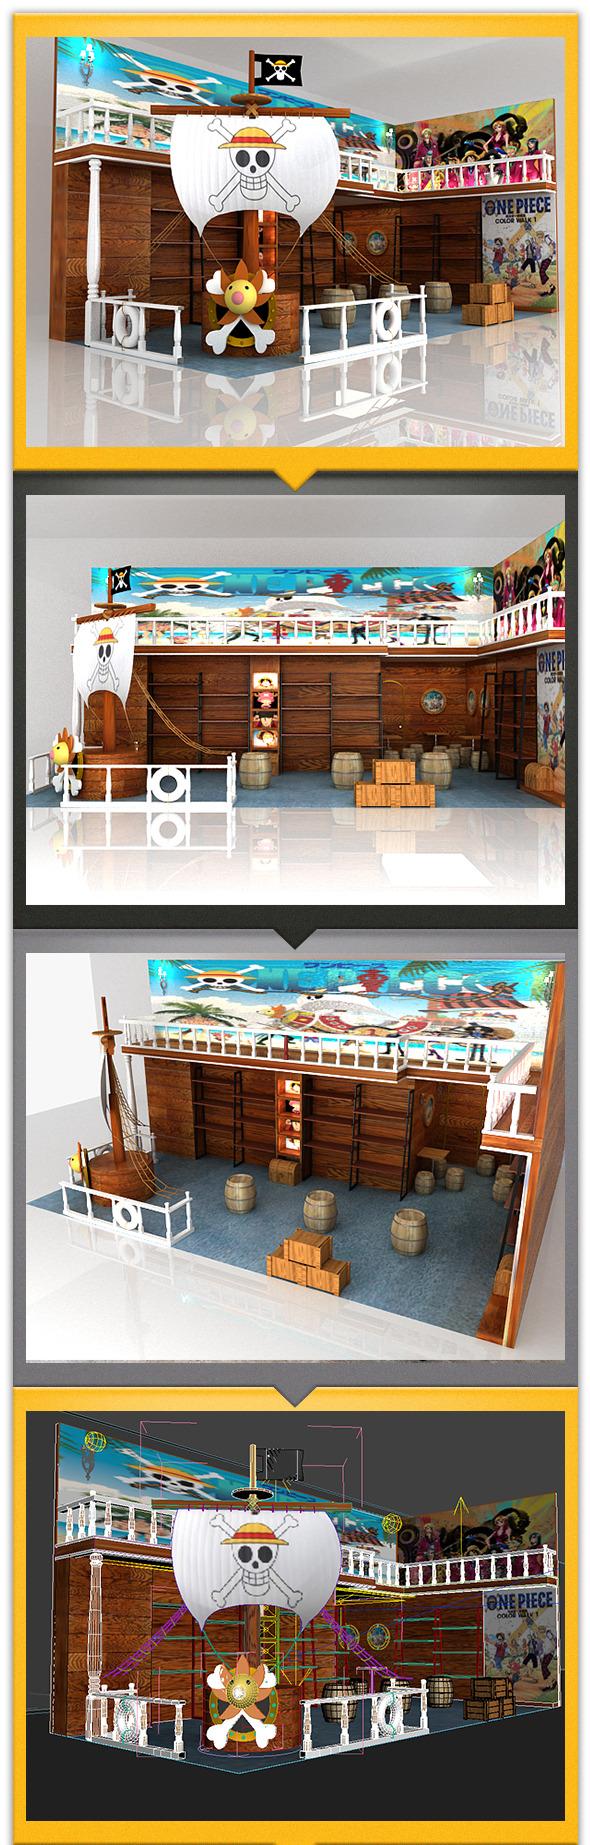 3DOcean Store in cartoon style 12237199